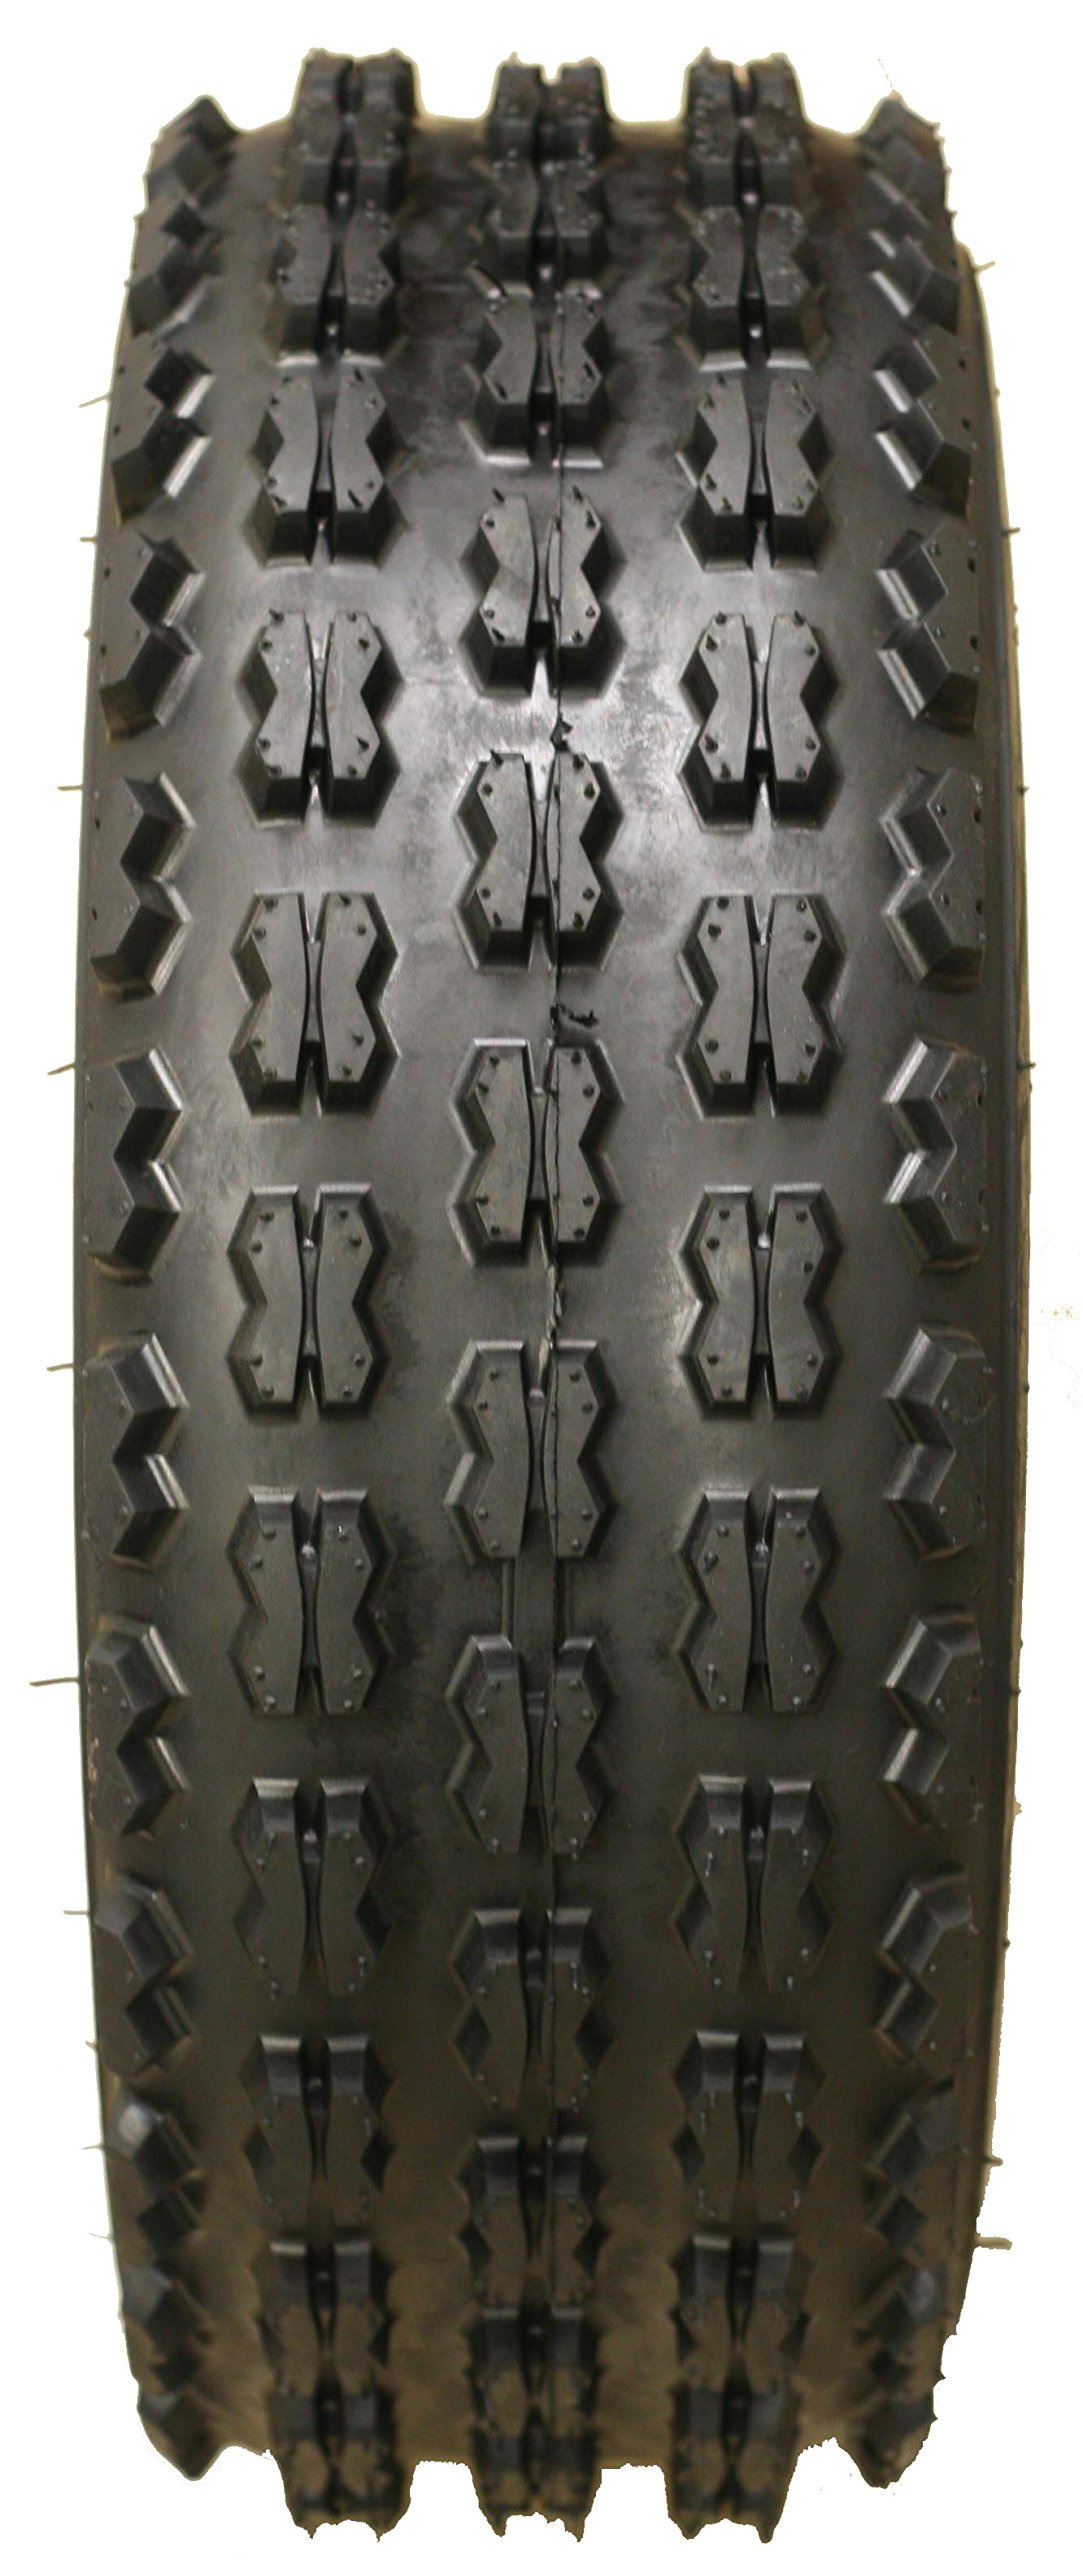 Set of 4 New Sport ATV Tires 22x7-10 Front & 22x10-10 Rear /4PR - 10077/10089 by Wanda (Image #4)